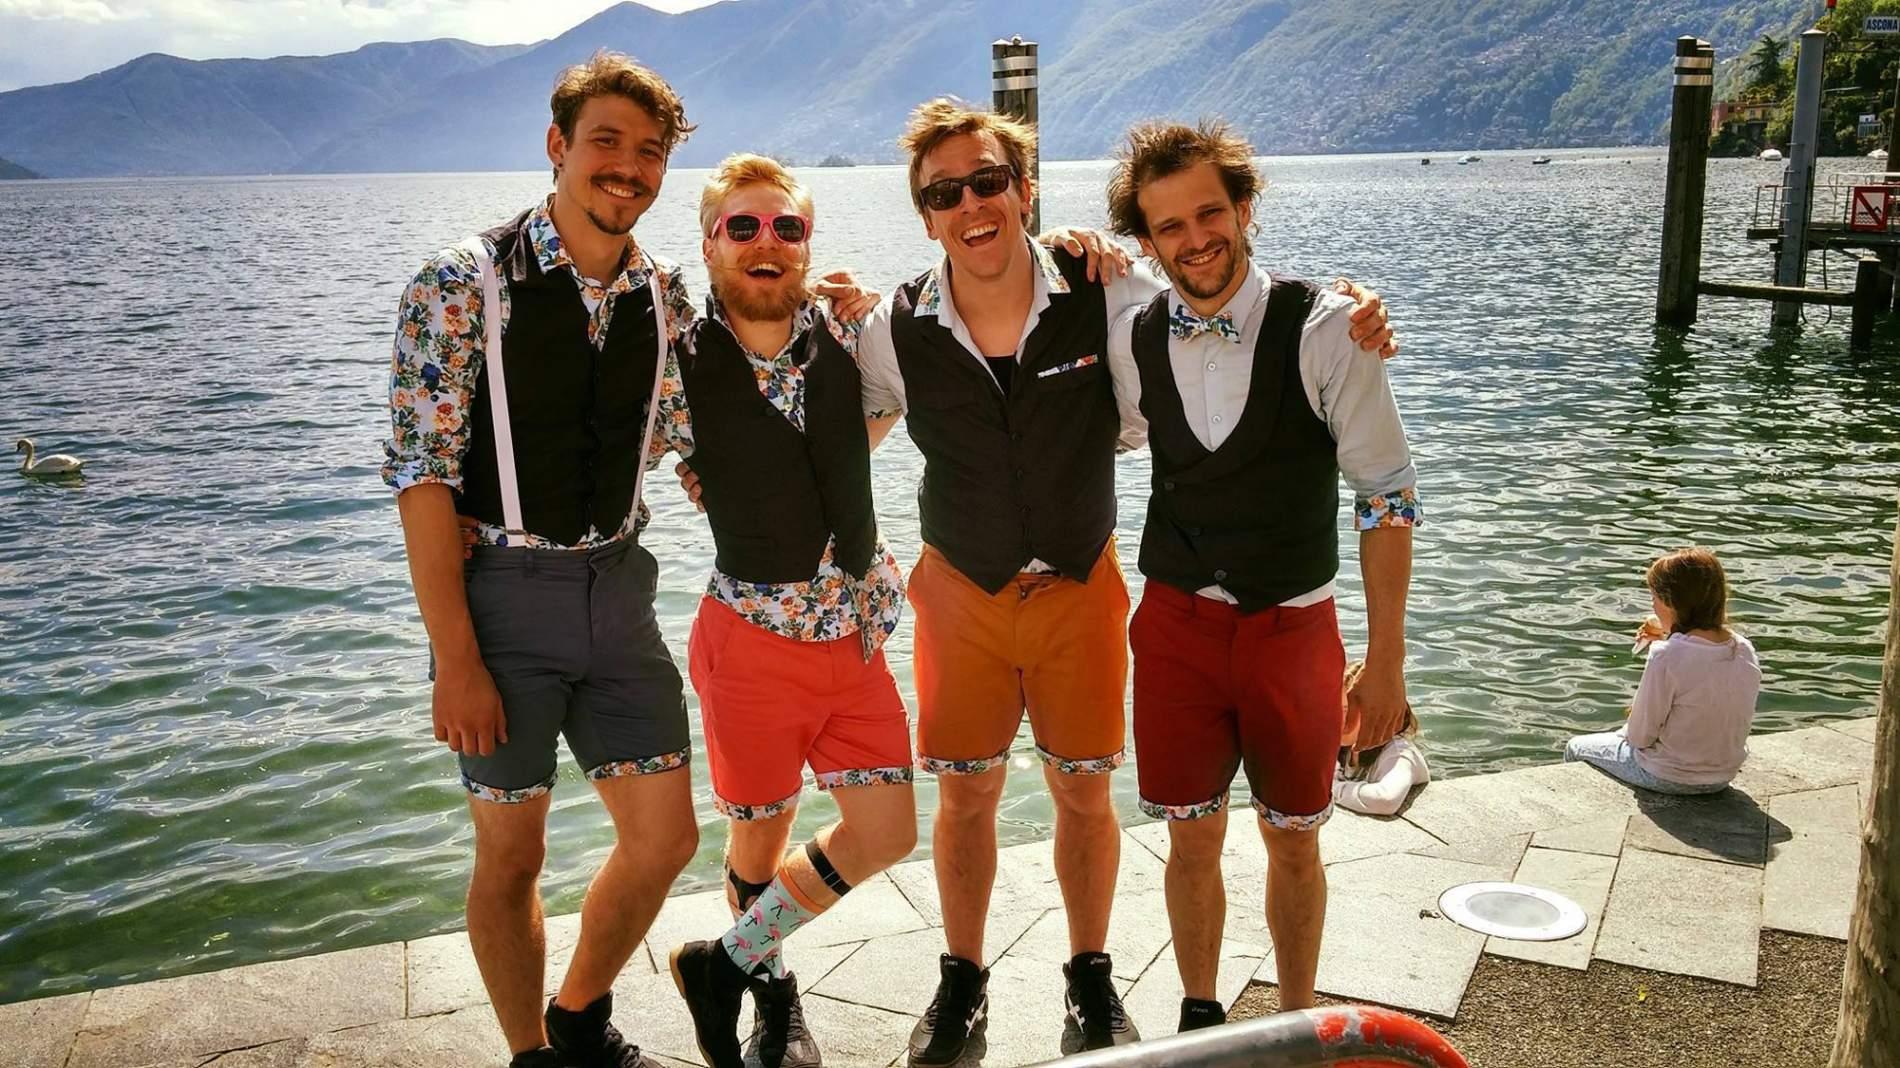 What's next Quatuor Stomp cirque spectacle rue acrobatique comedie